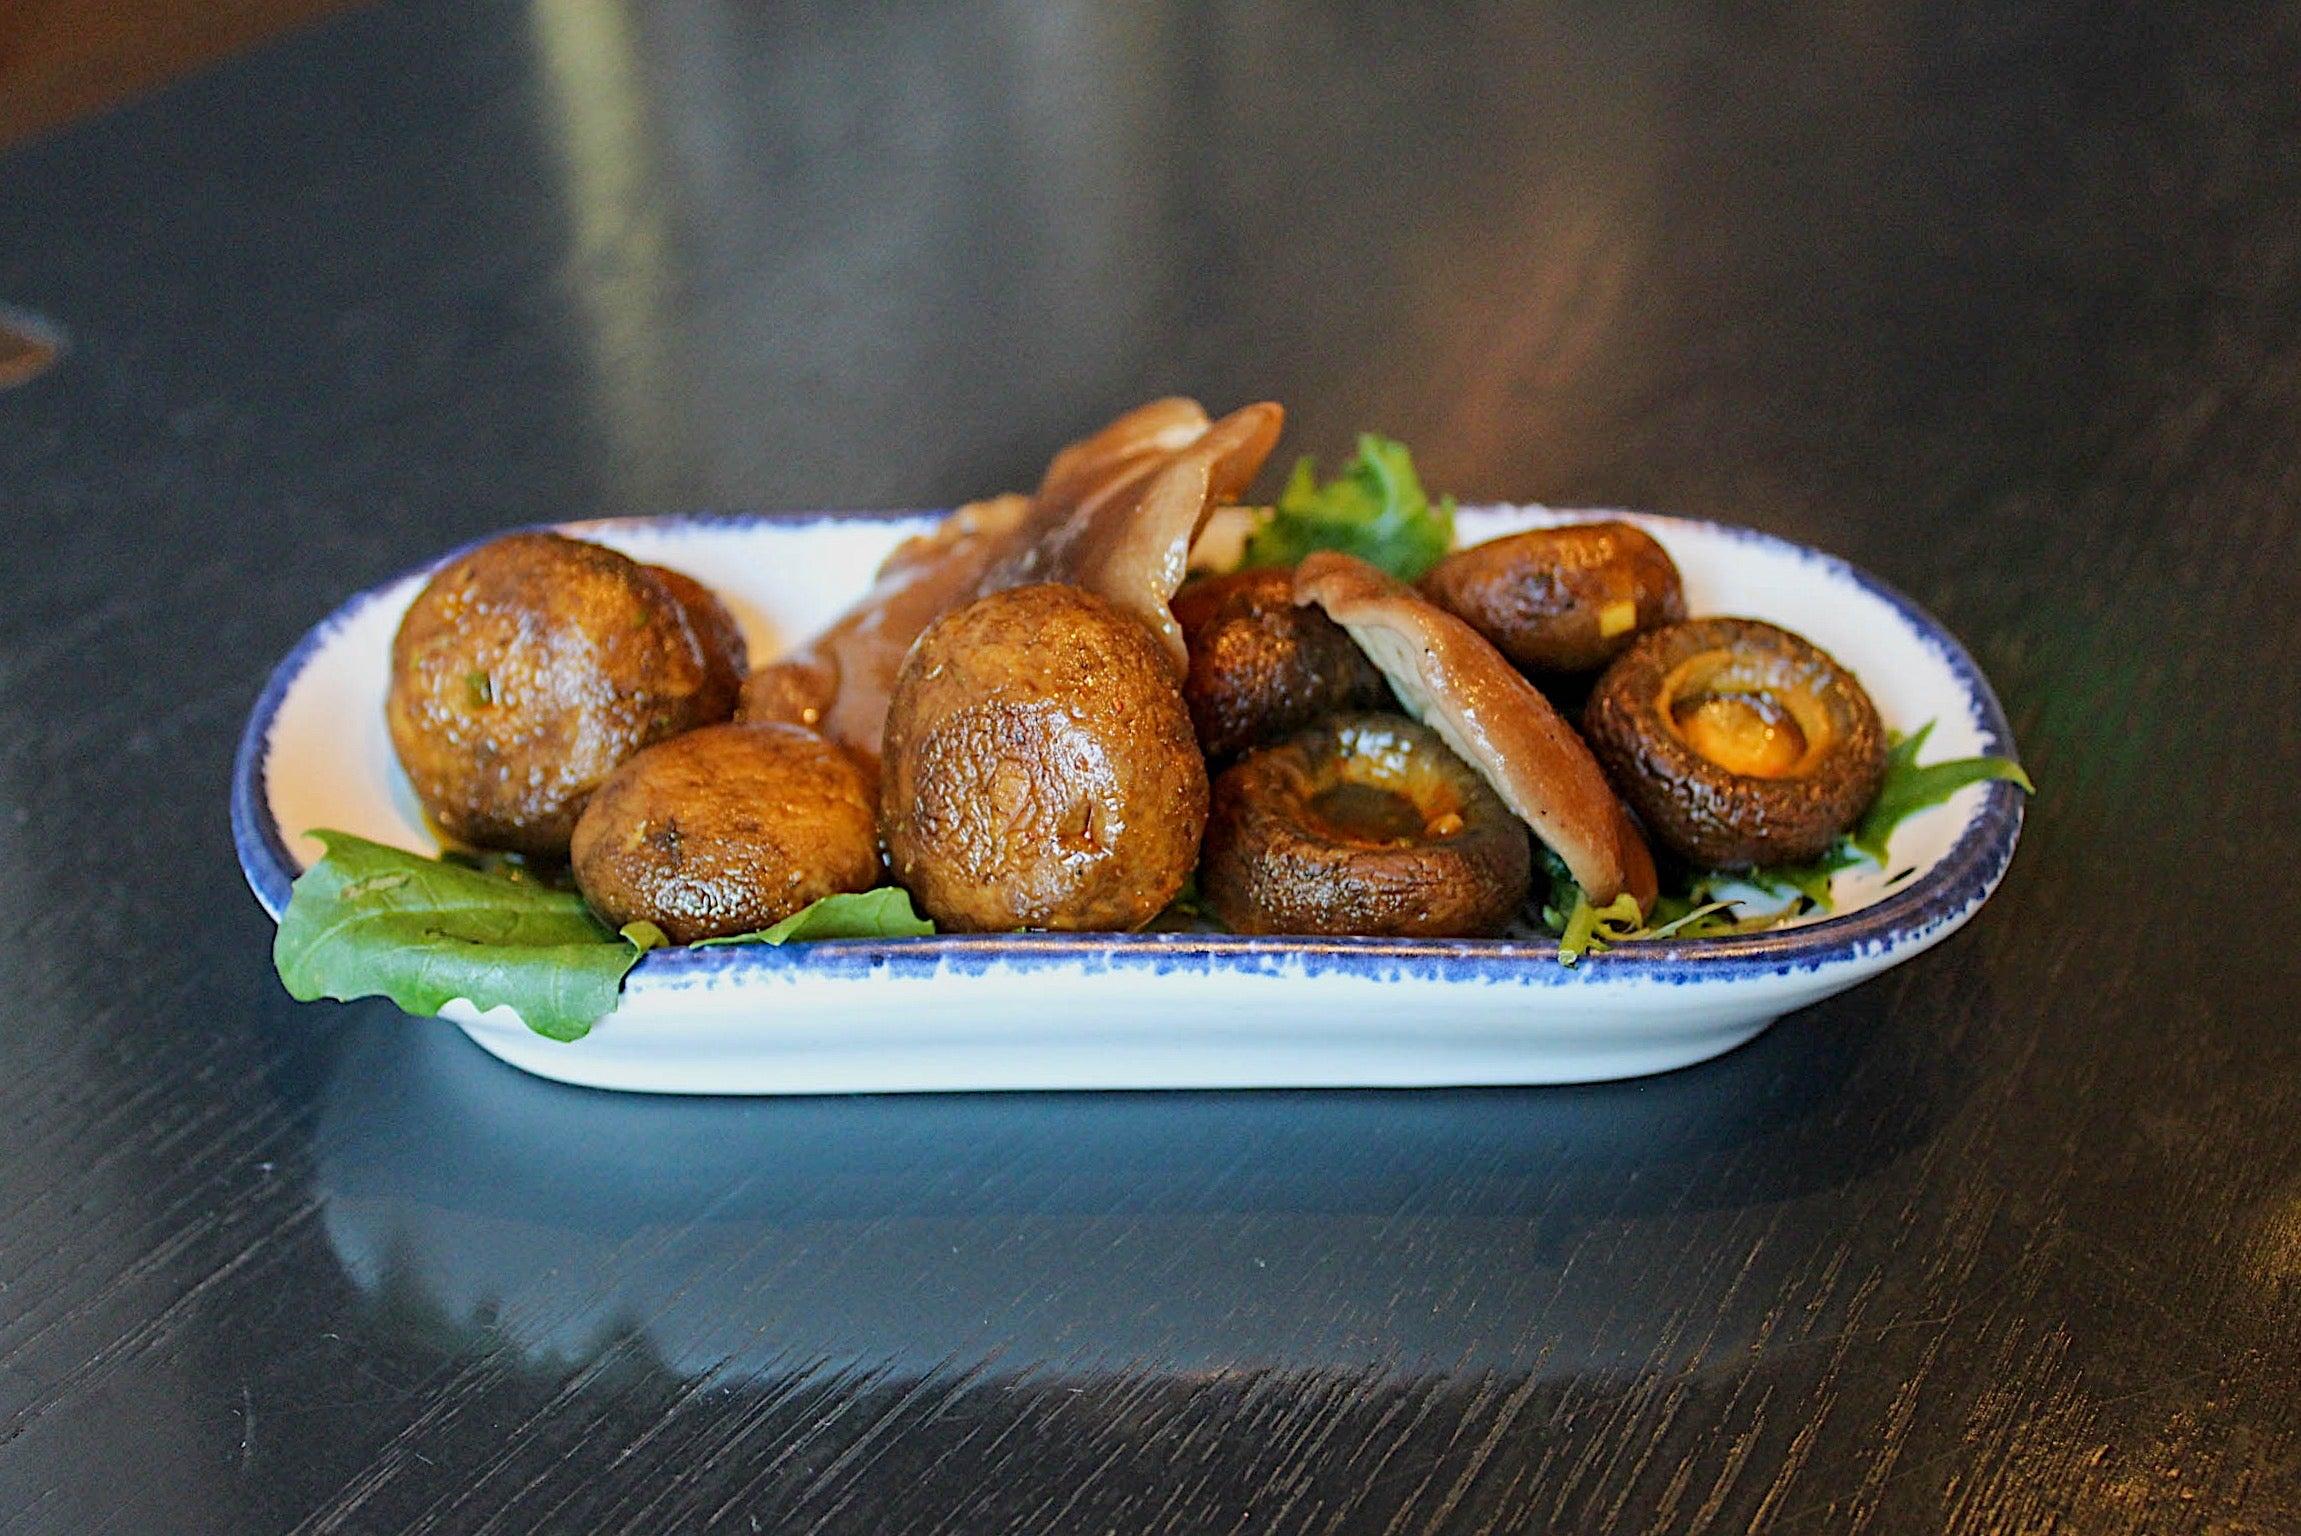 Mushrooms from Peregrine